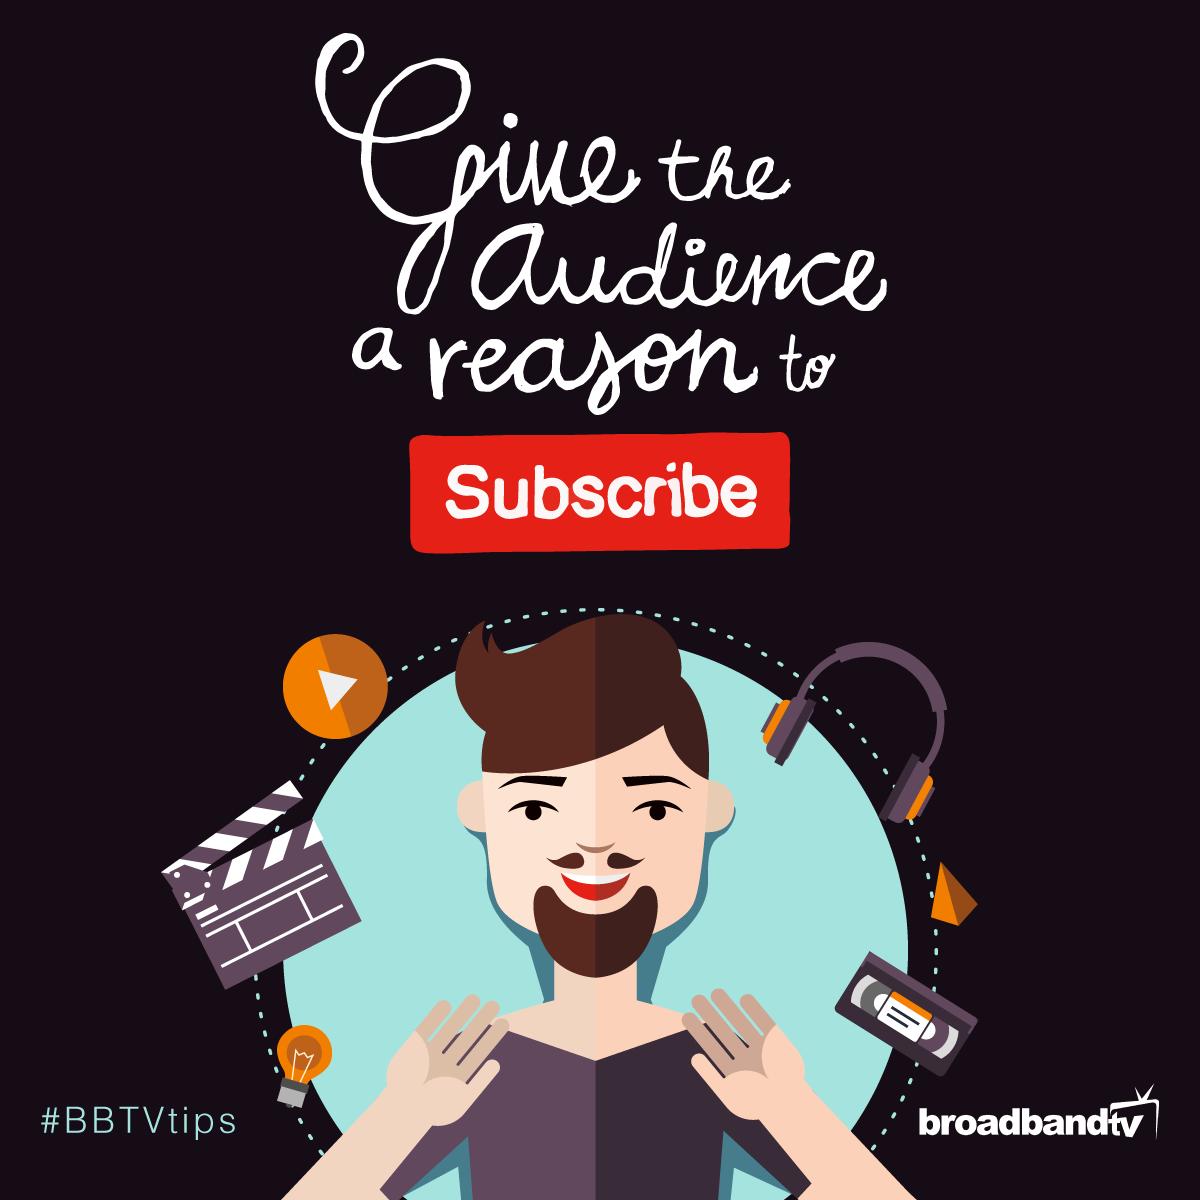 BBTVtips_ReasonToSubscribe_Button_Facebook